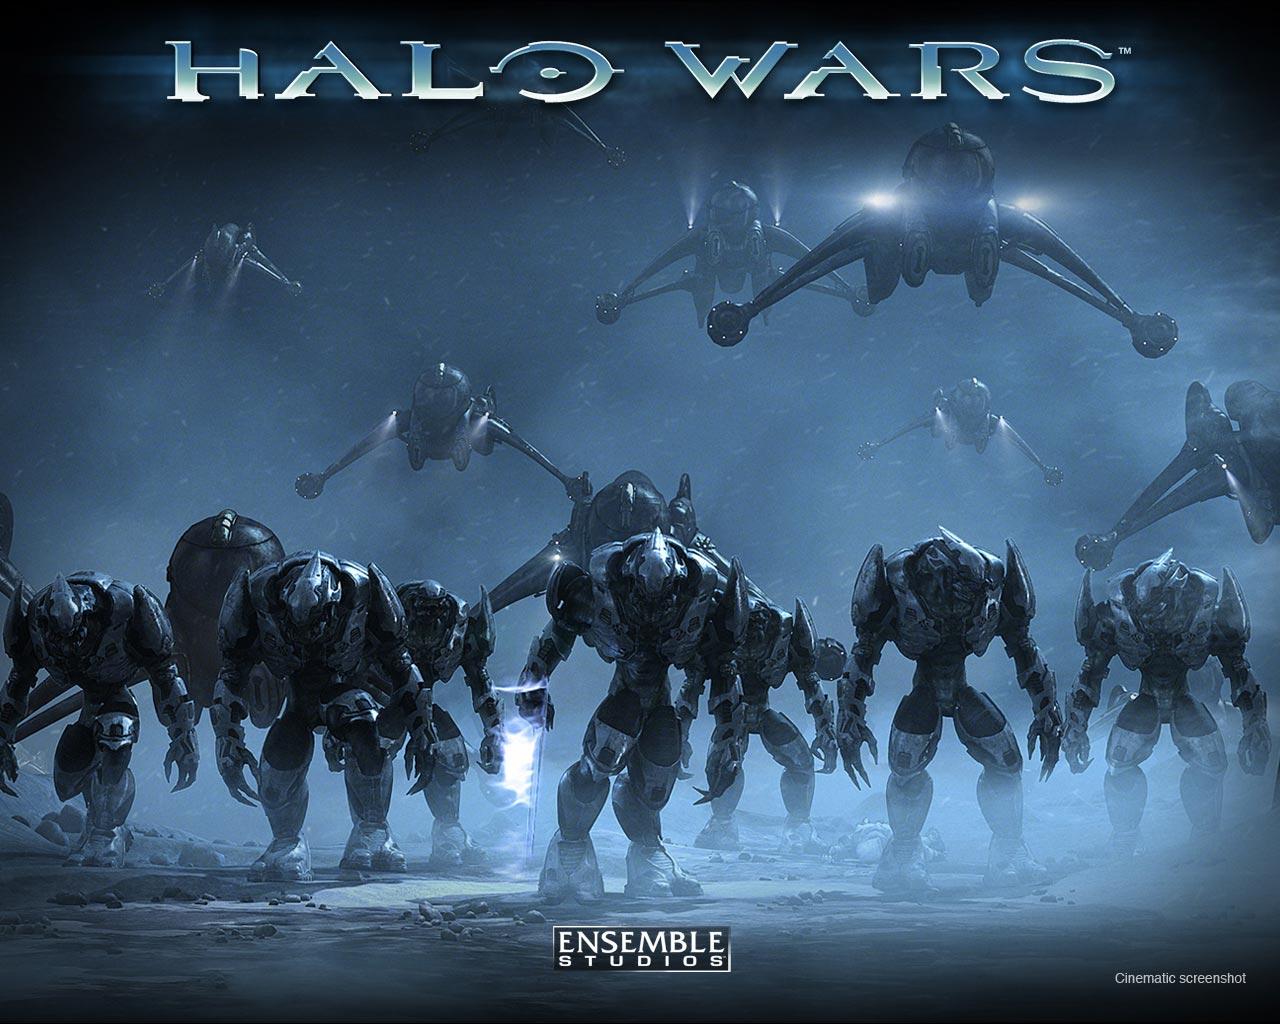 Halo Wars Elite Wallpaper 5337 Hd Wallpapers in Games   Imagescicom 1280x1024